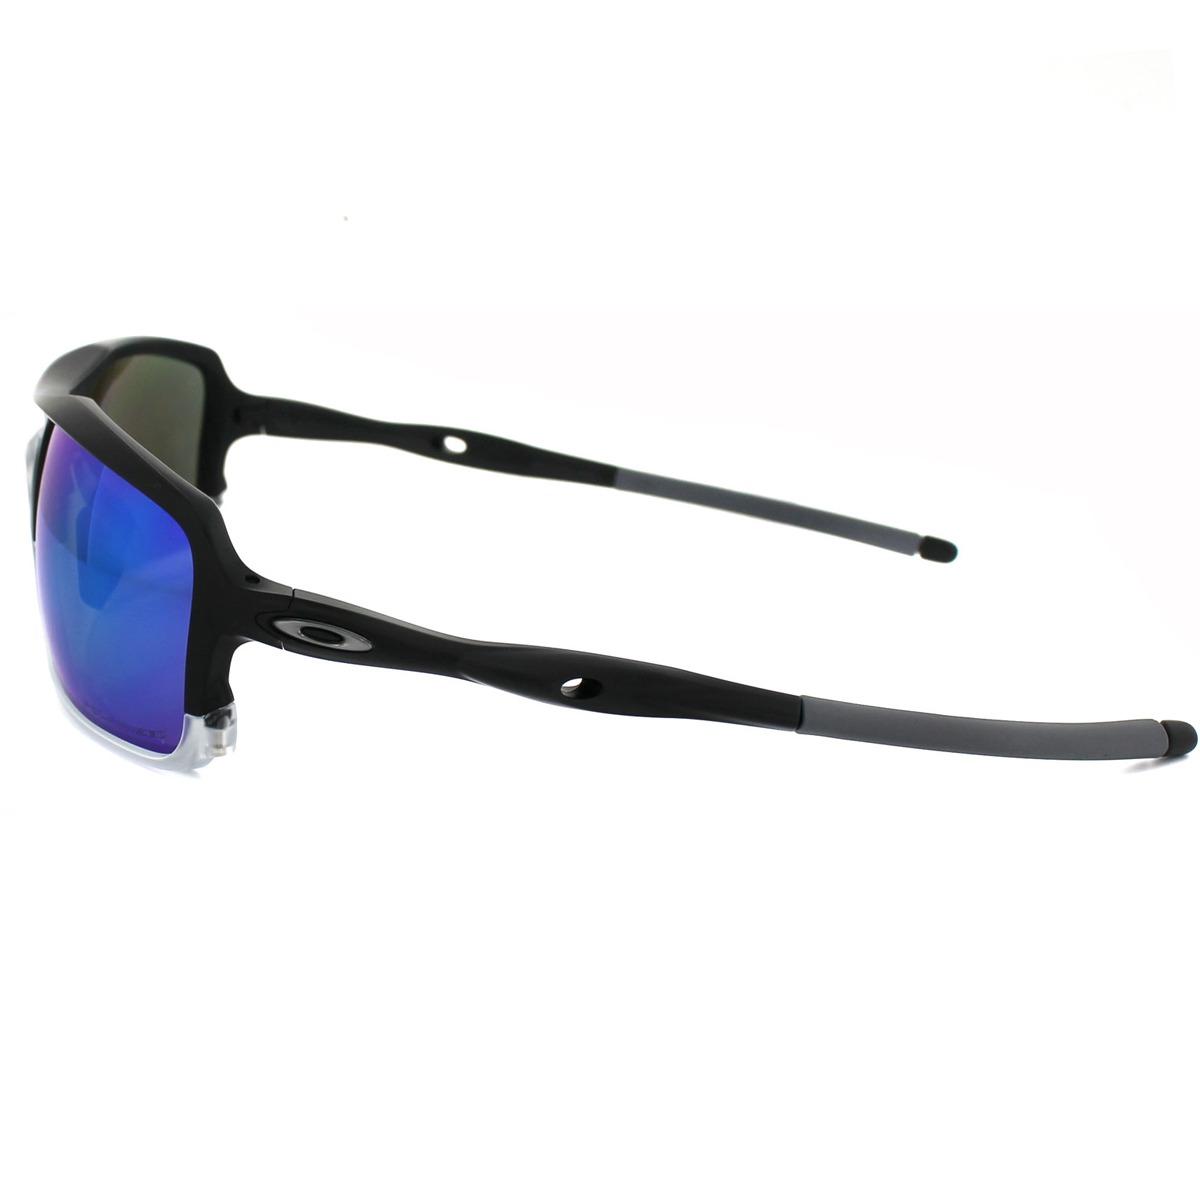 ab86312c4 Óculos Oakley Triggerman Matte Black C/ Sapphire Iridium Pol - R$ 599,90 em  Mercado Livre